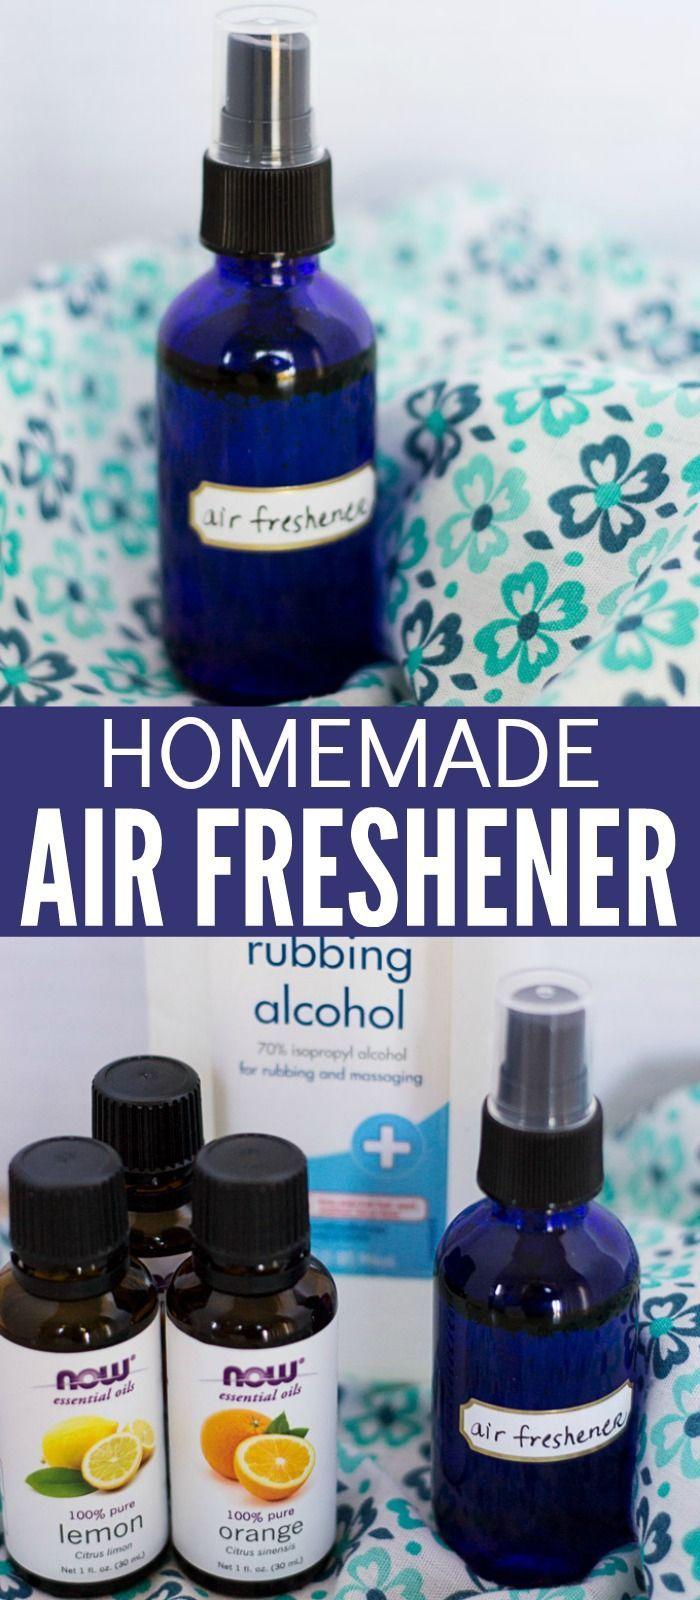 Homemade Air Freshener Spray Made with Essential Oils